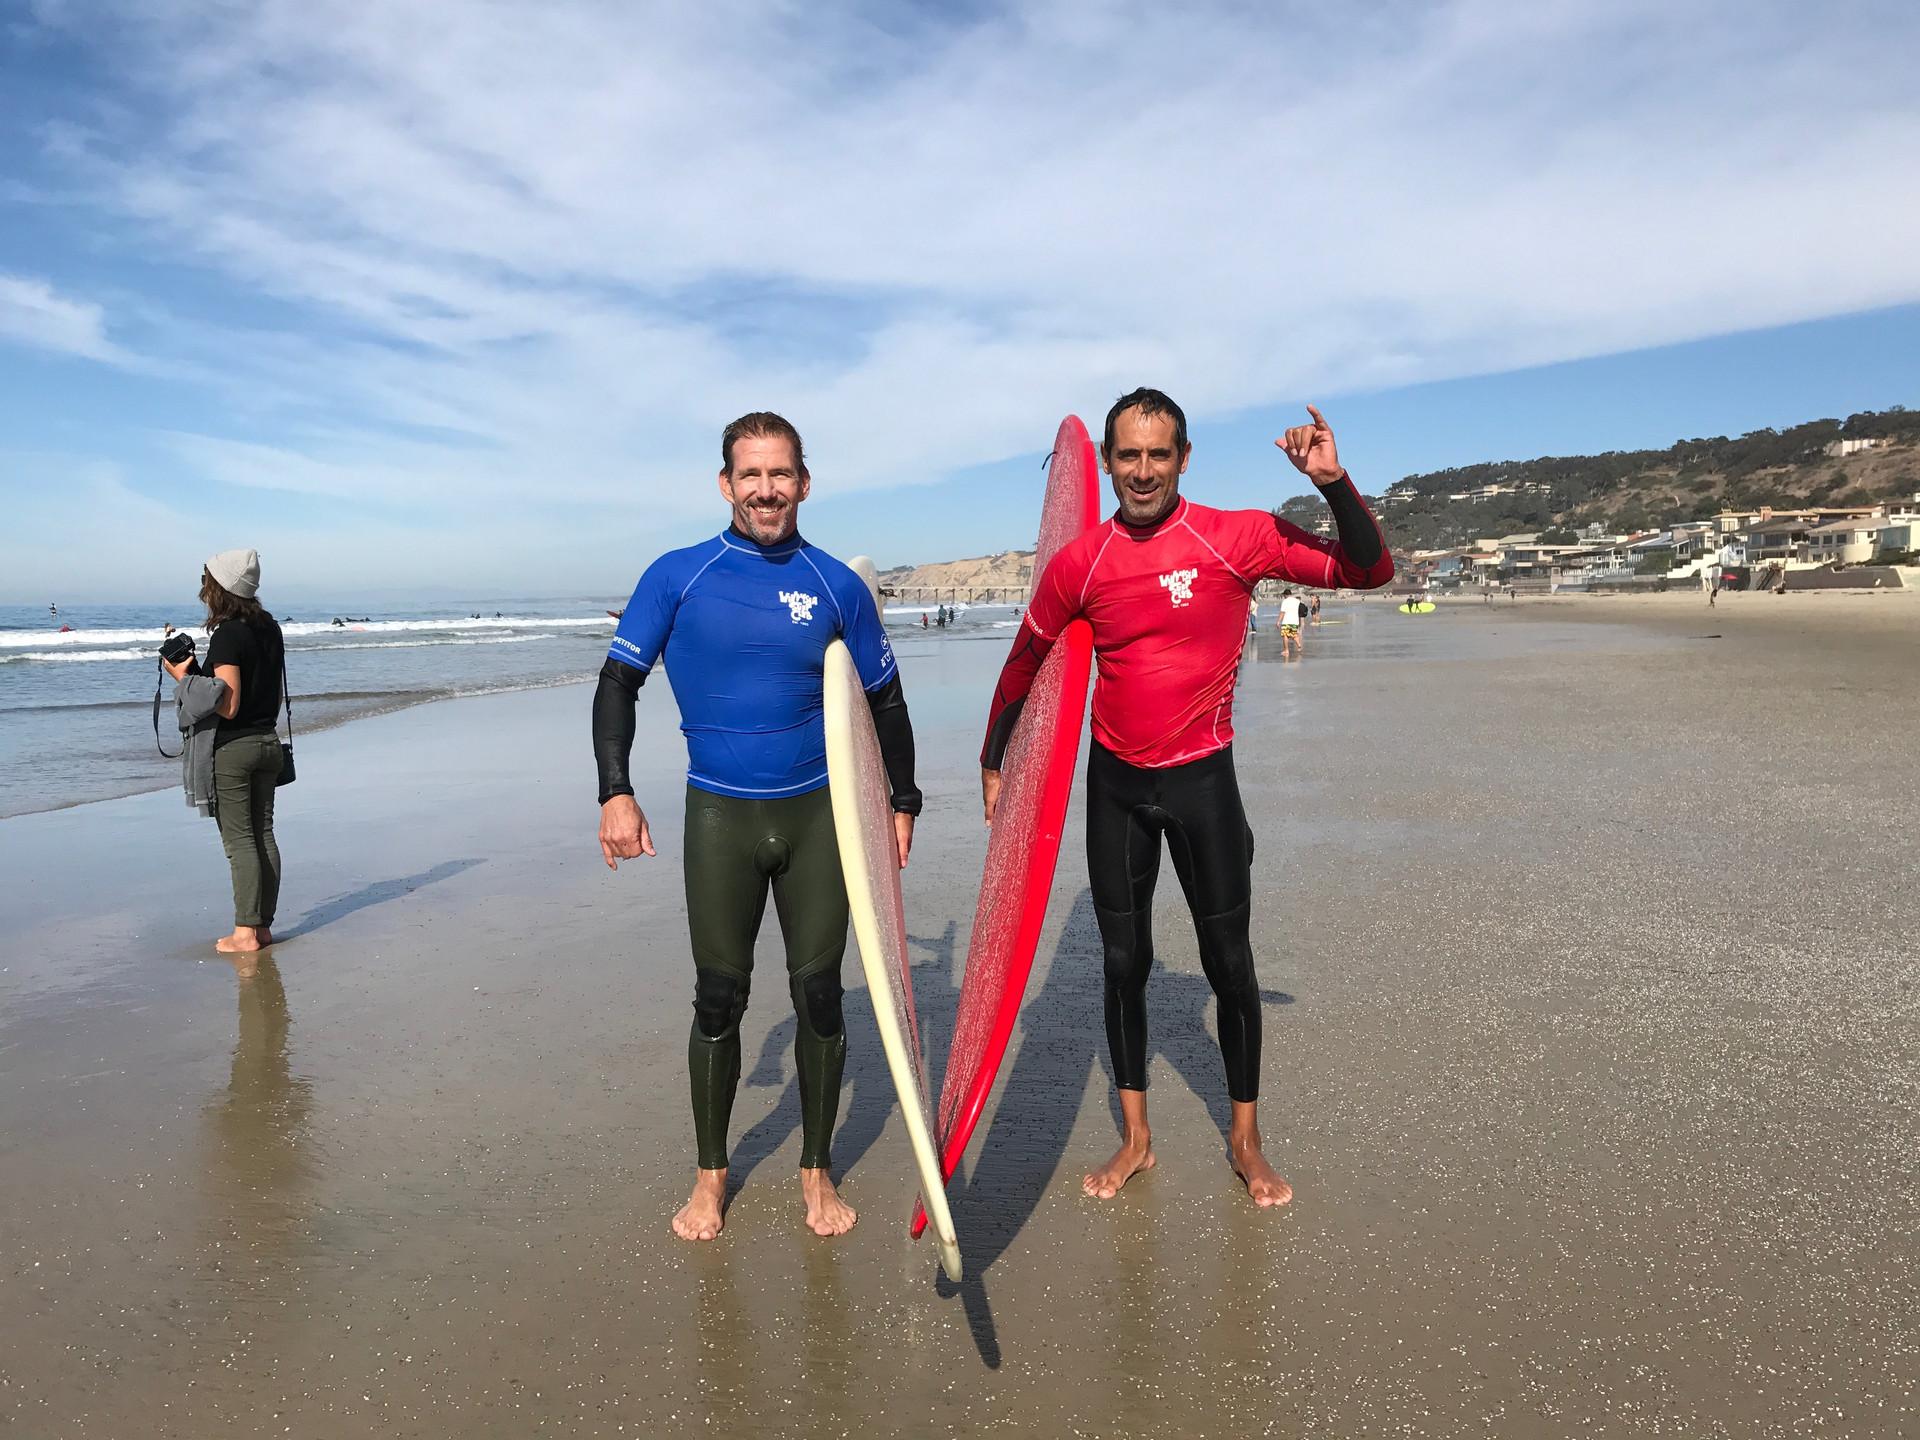 Windansea and Baja Surf Club